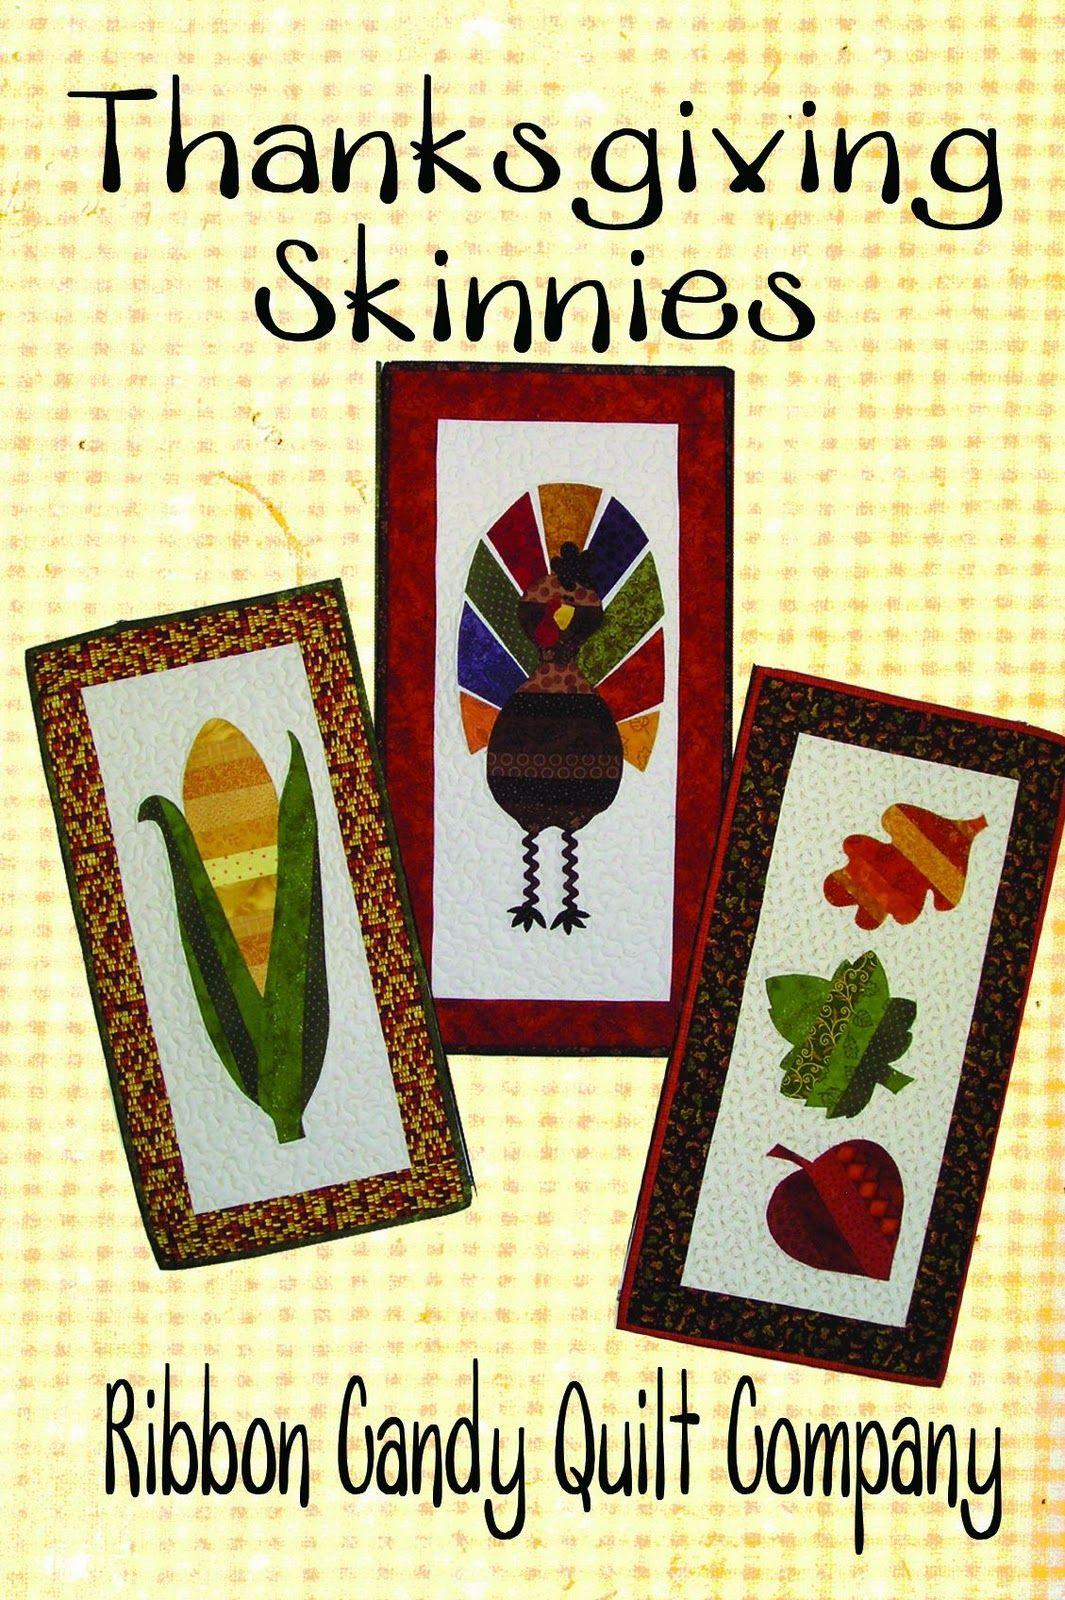 Ribbon Candy Quilt Company: Seasonal Skinnies Patterns | Quilting ... : ribbon candy quilt - Adamdwight.com